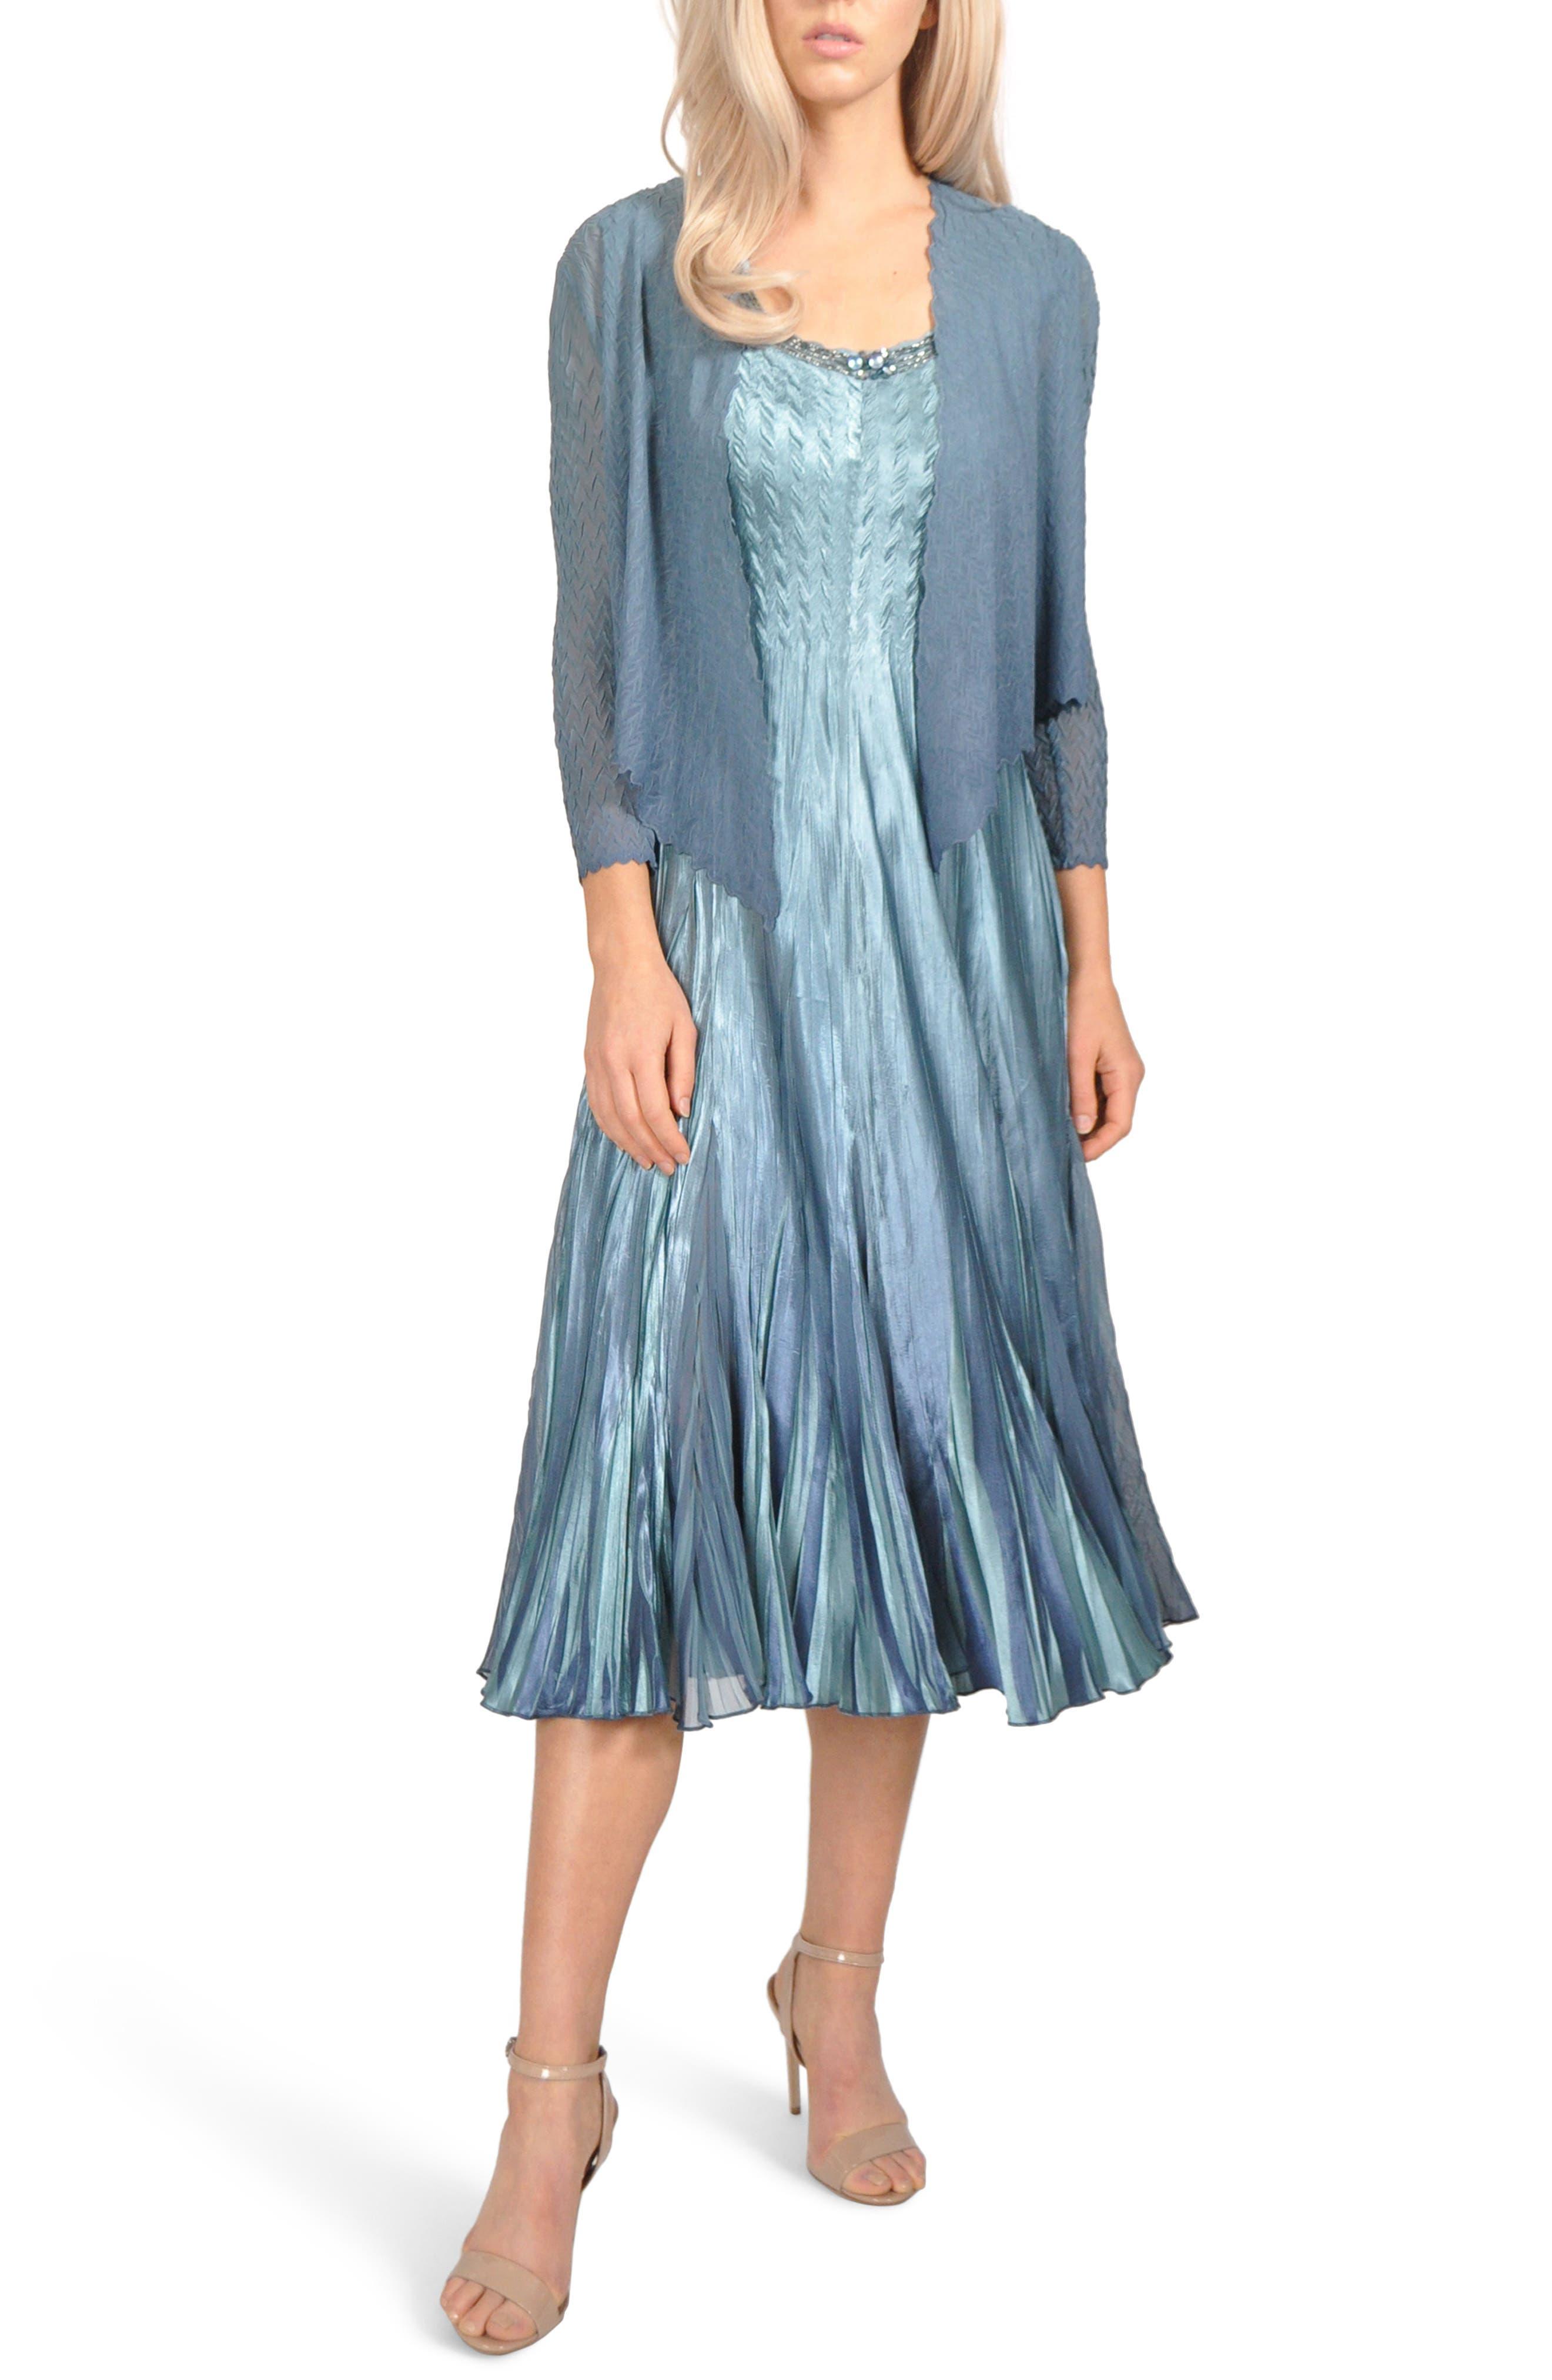 KOMAROV Embellished Pleat Mixed Media Dress with Jacket, Main, color, 405